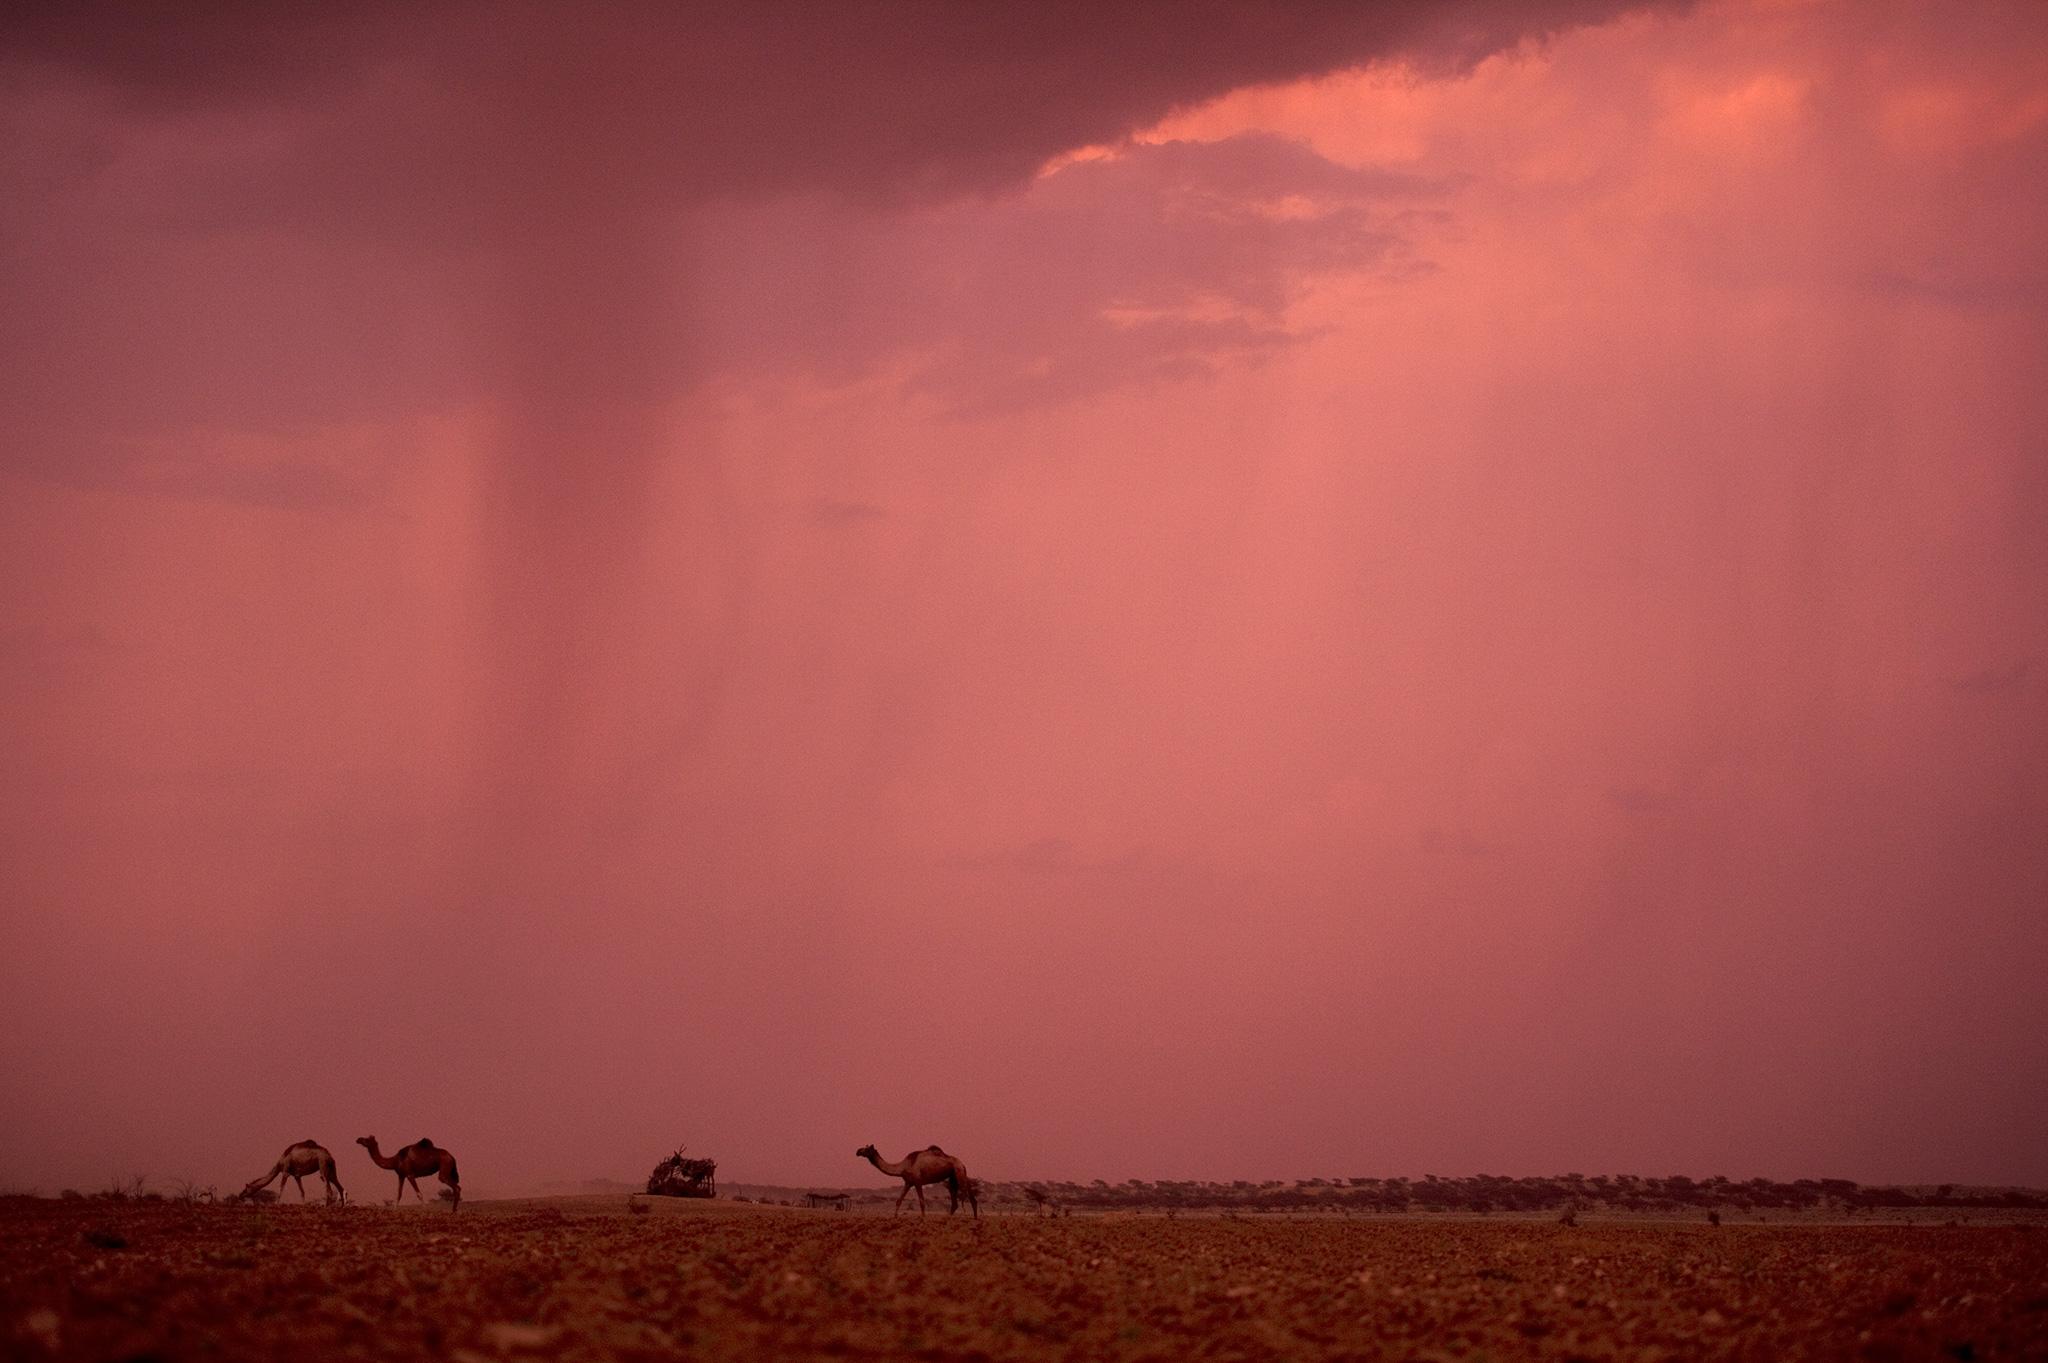 camels_rain.jpg